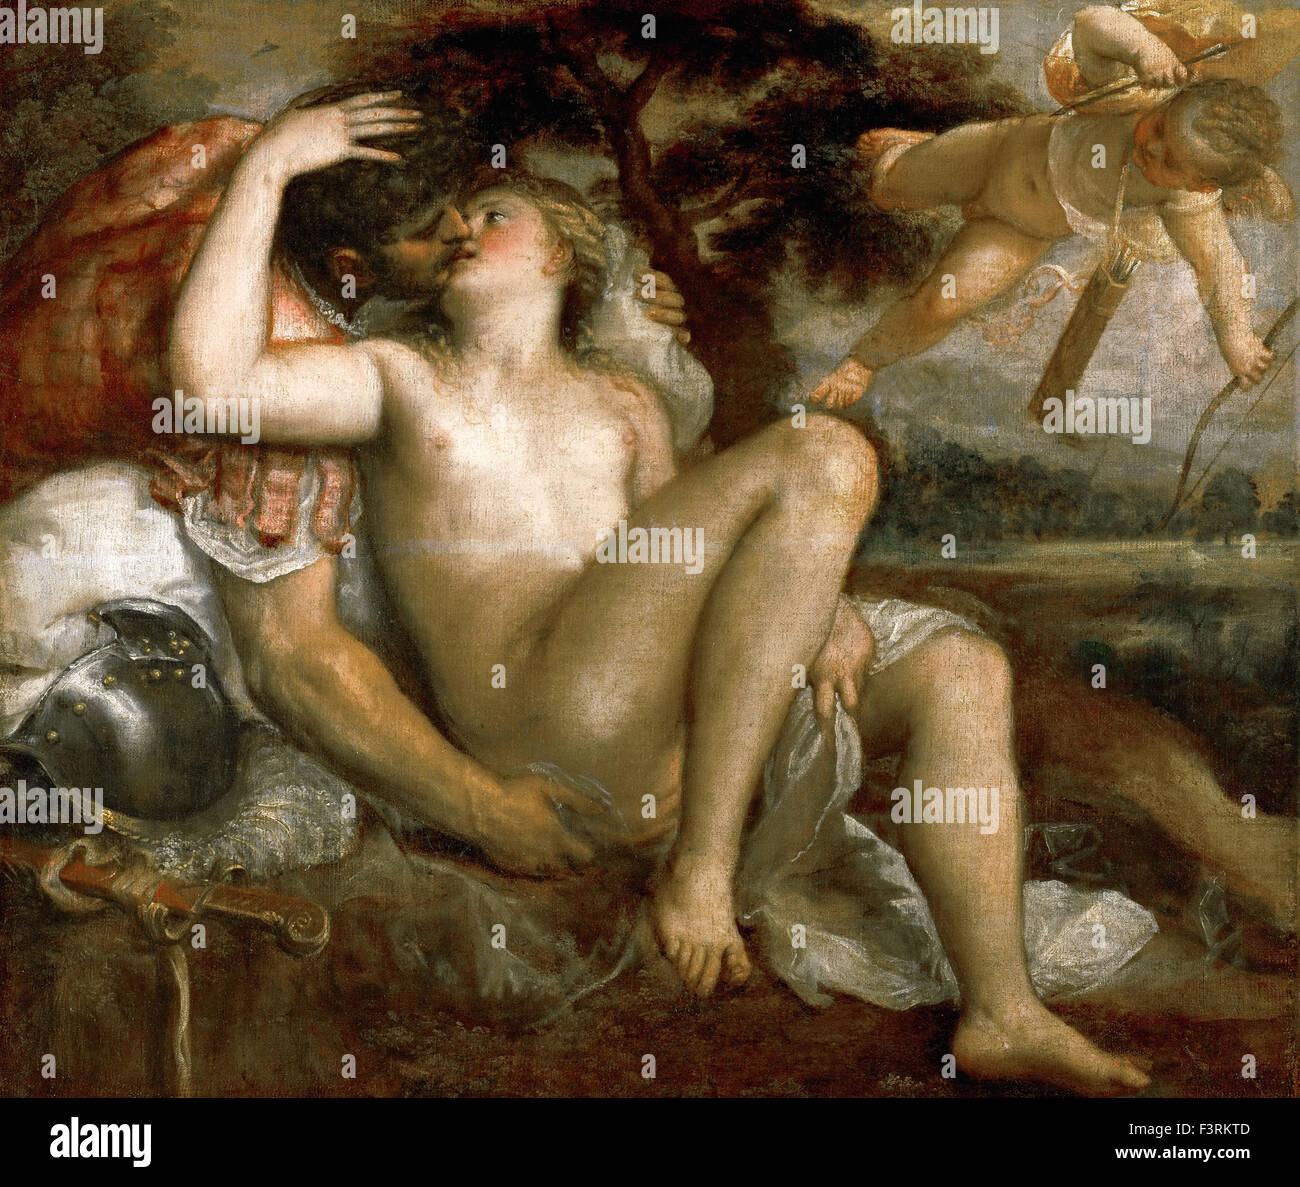 Tiziano Vecellio - Titian - Mars, Venus and Amor - Stock Image